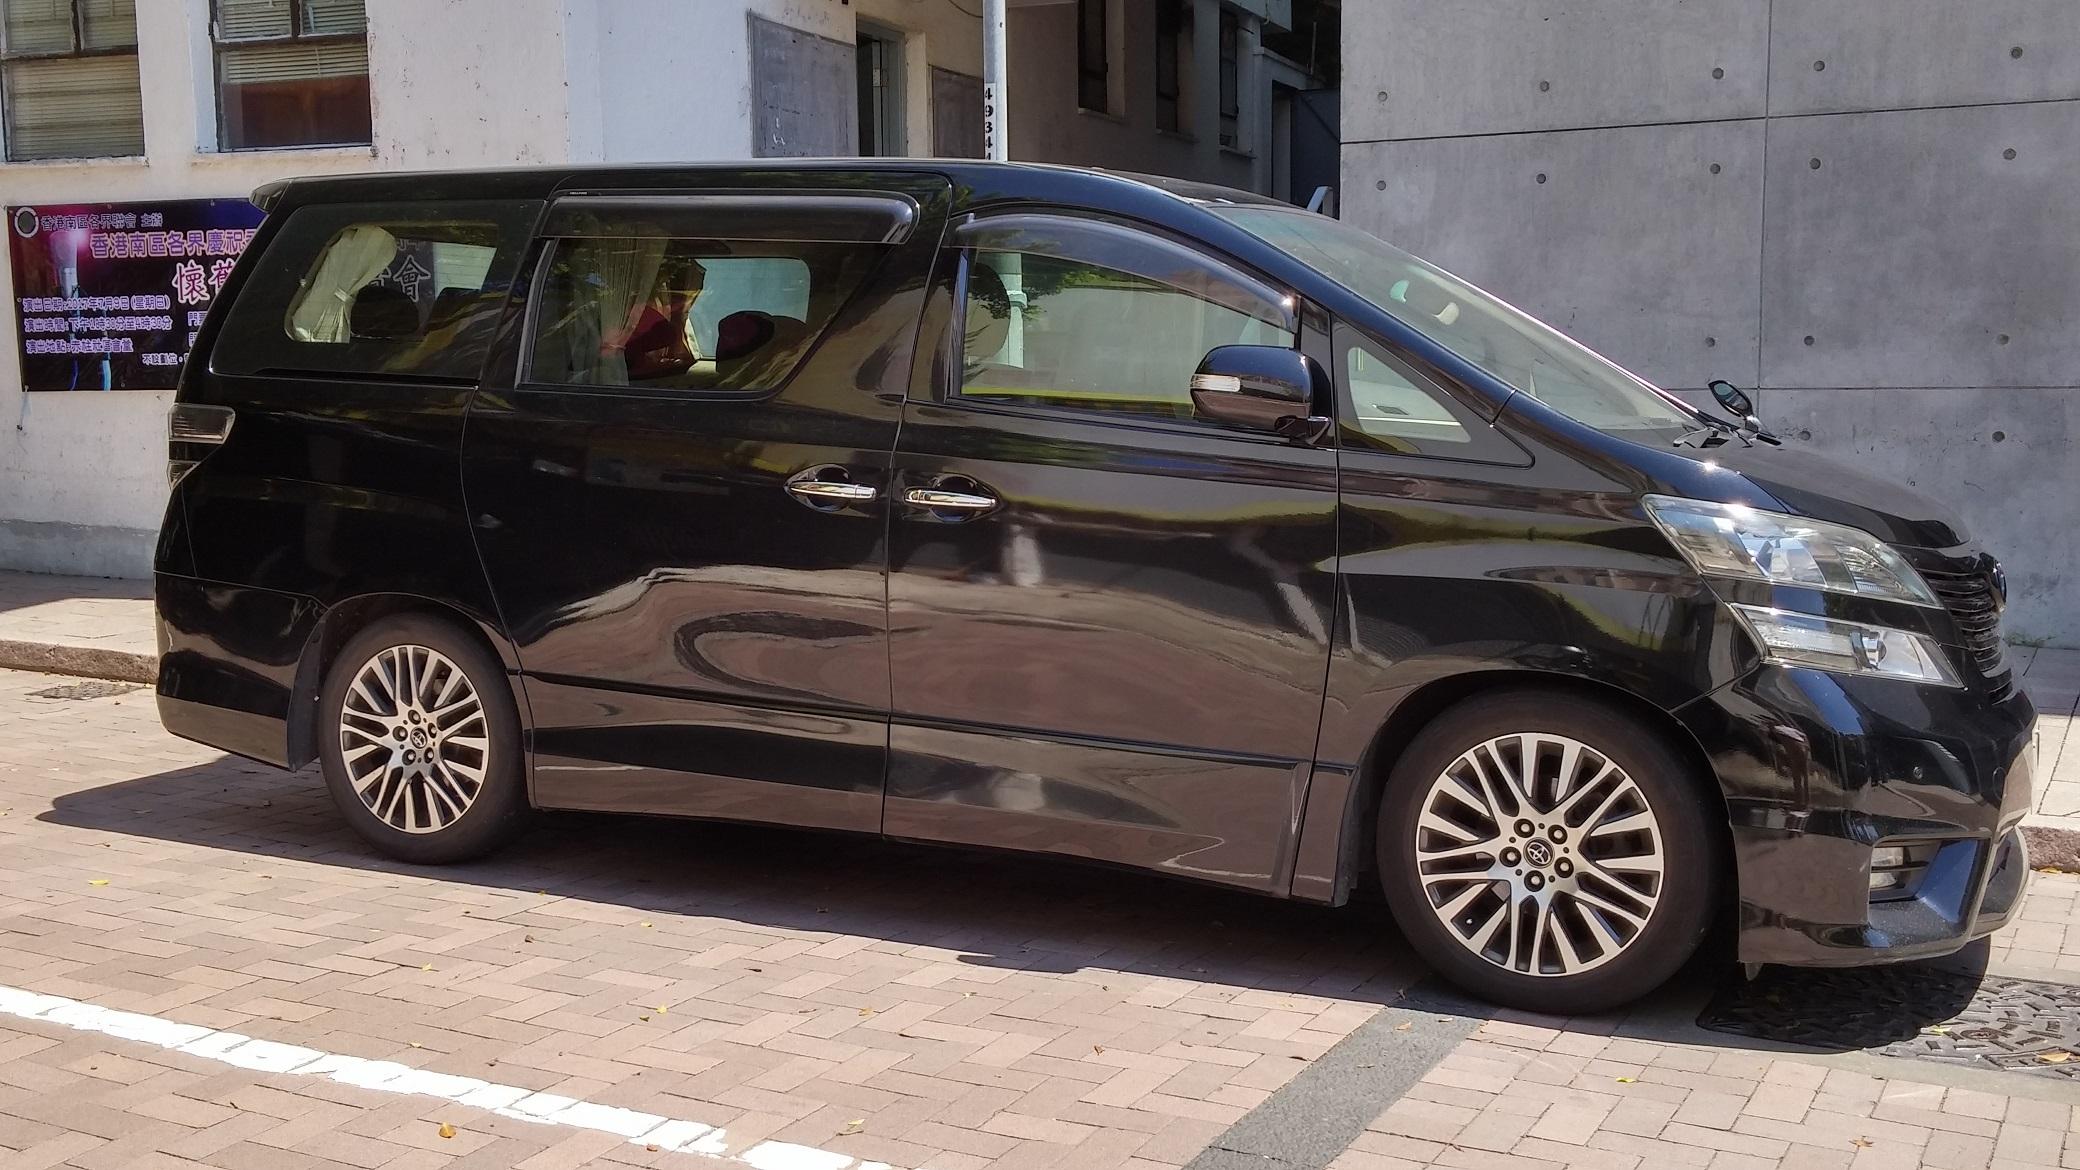 Black Toyota brand mini van